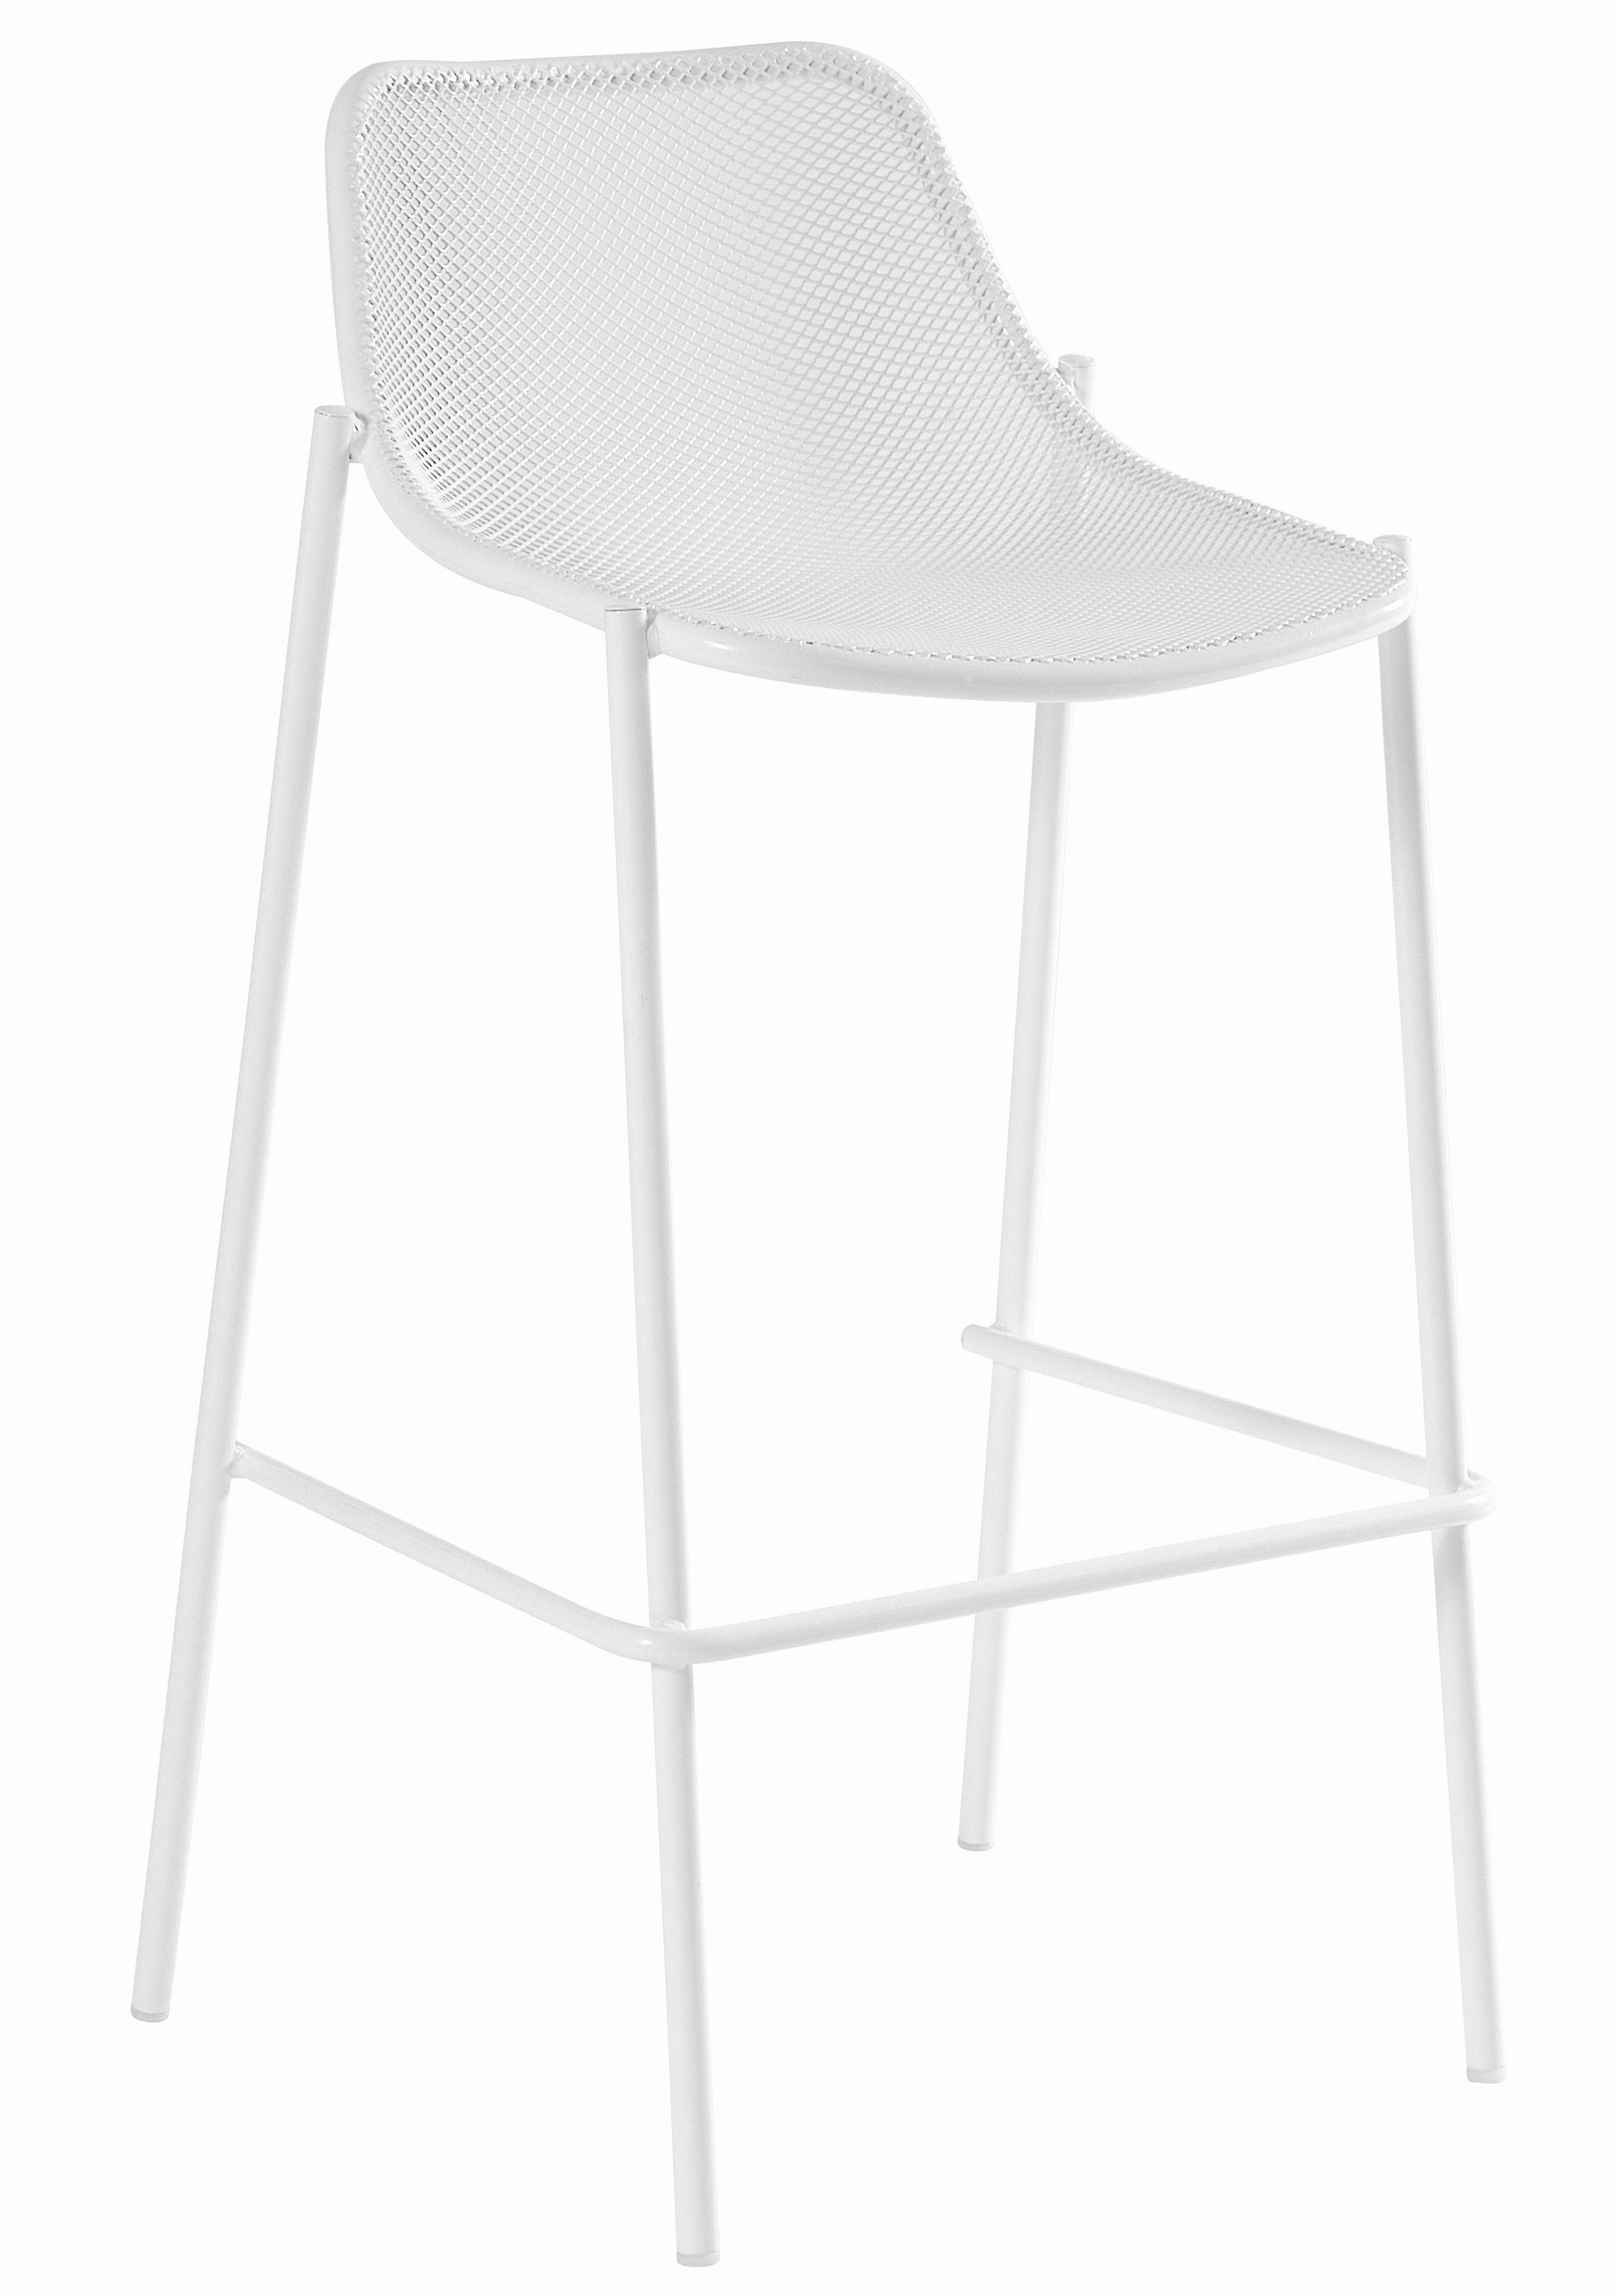 Arredamento - Sgabelli da bar  - Sedia da bar Round di Emu - Bianco - Acciaio